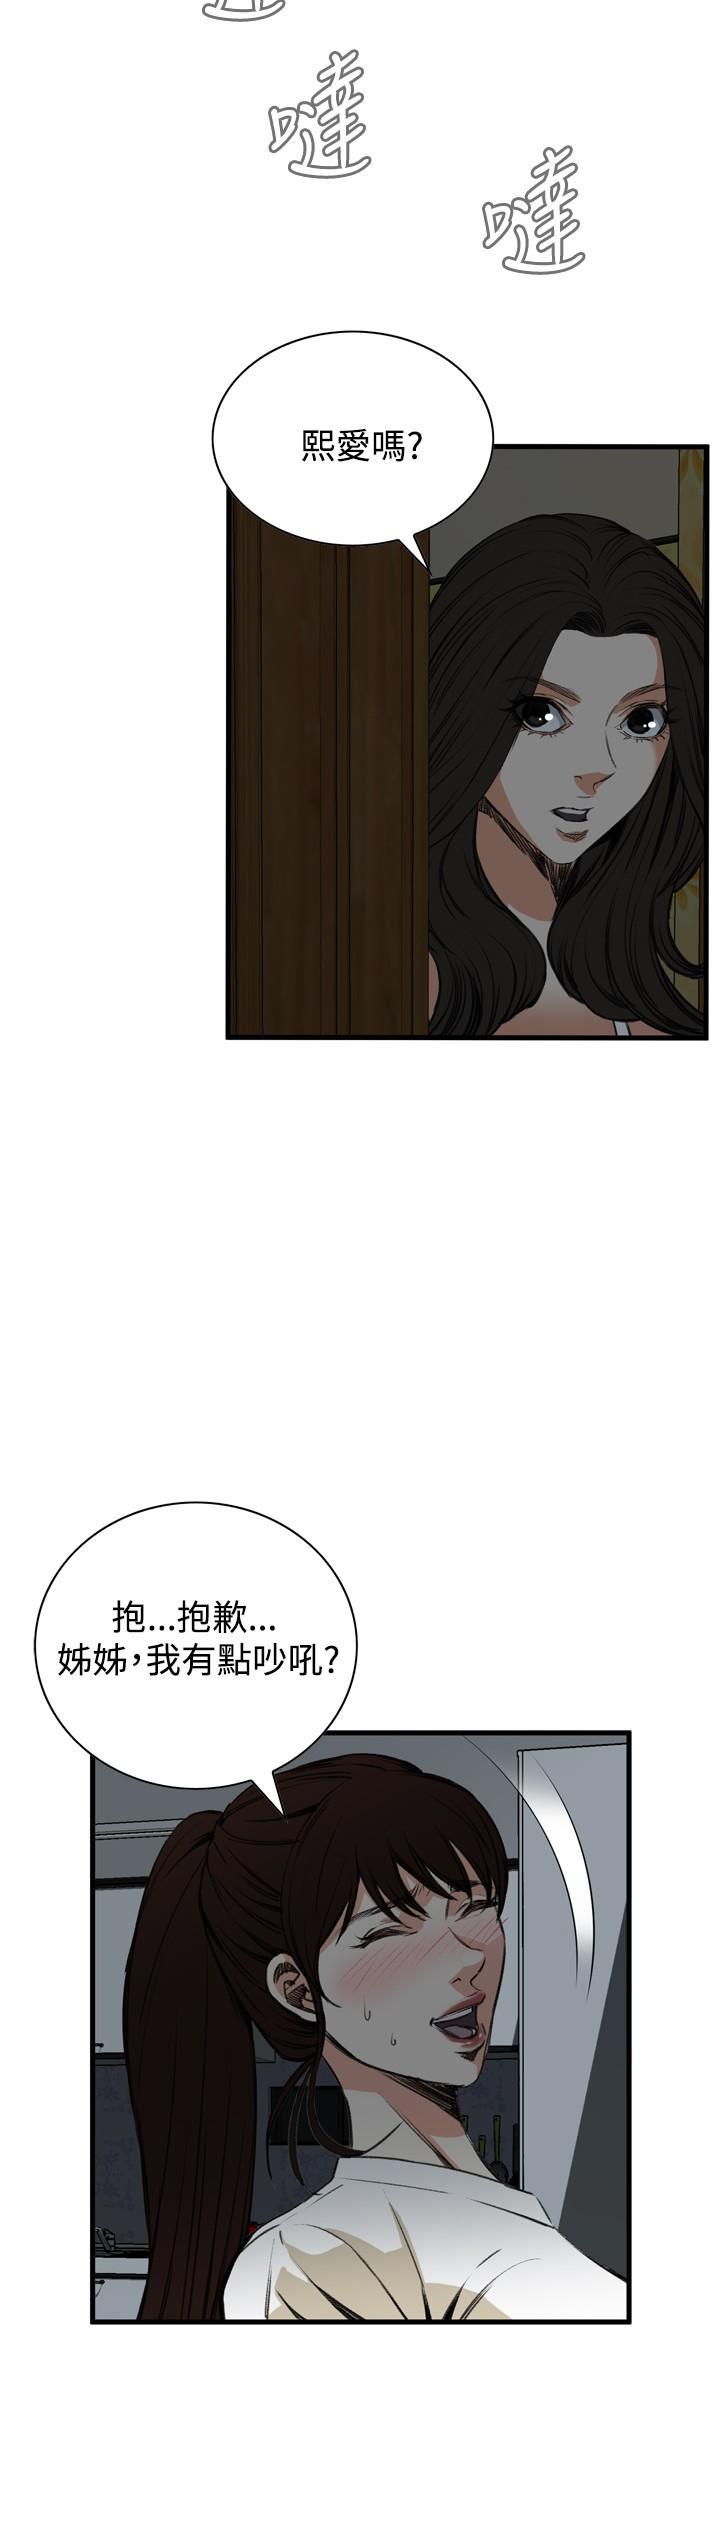 Take a Peek 偷窥 Ch.39~51 [Chinese]中文 183